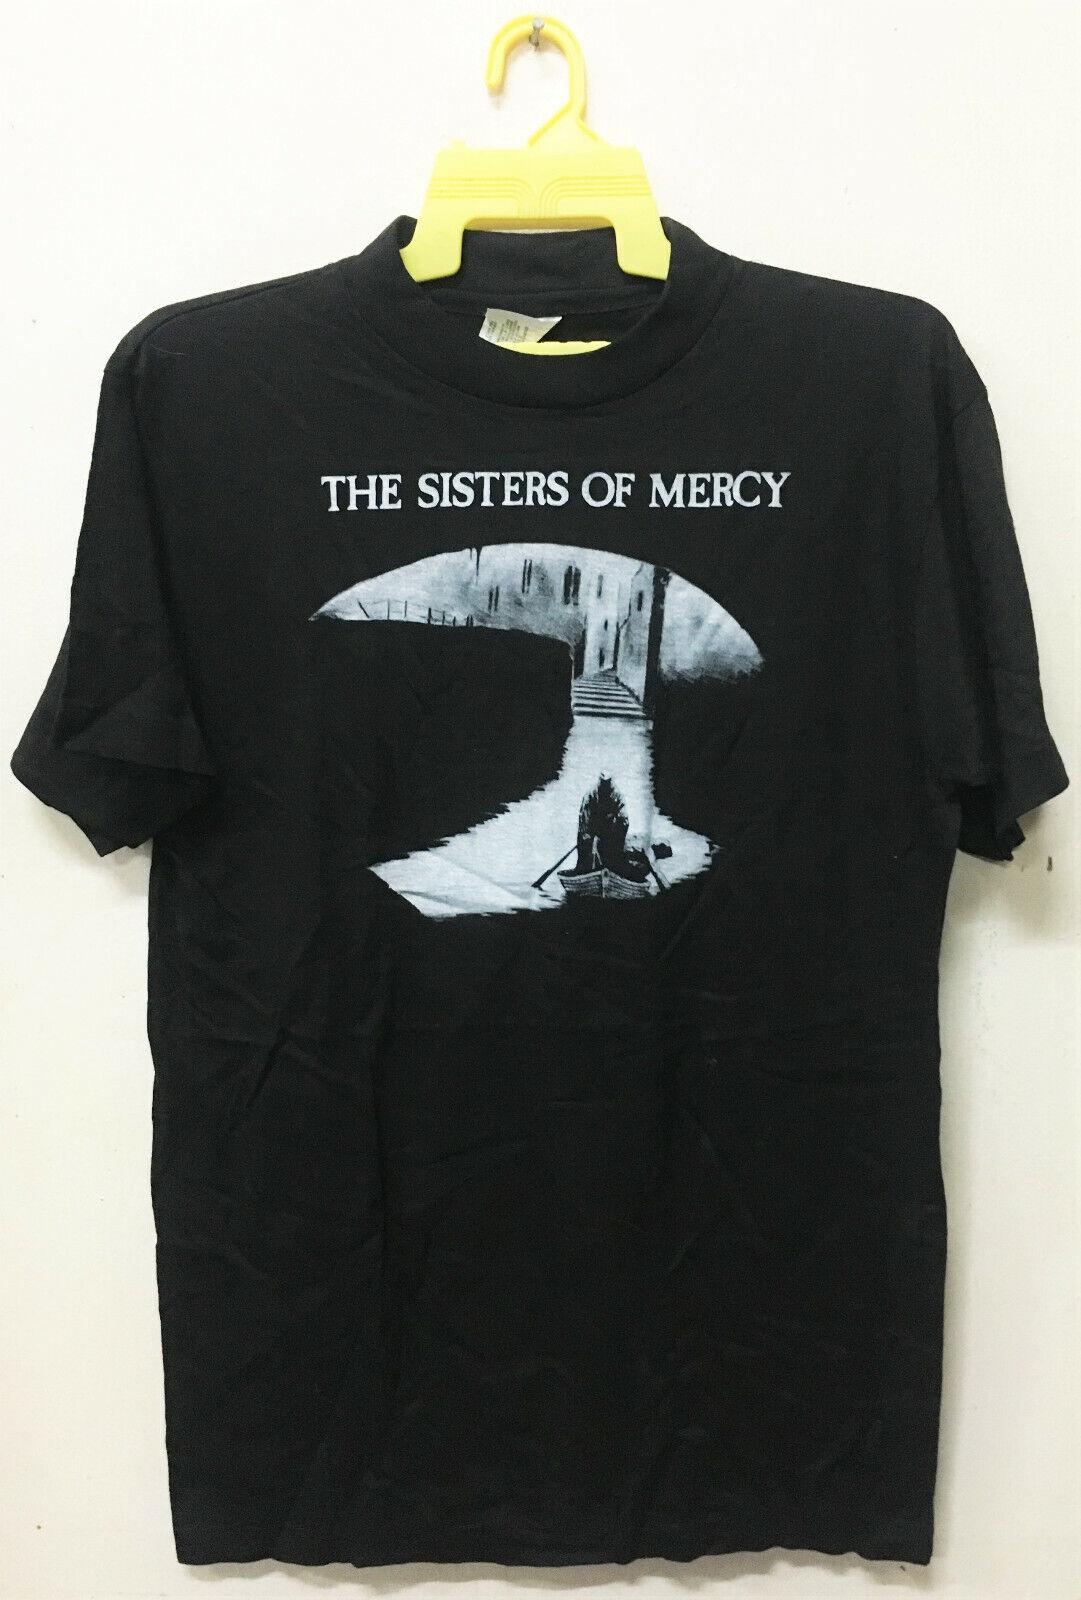 BAUHAUS GOTH PUNK ROCK T-SHIRT siouxsie sisters of mercy joy division S-3XL